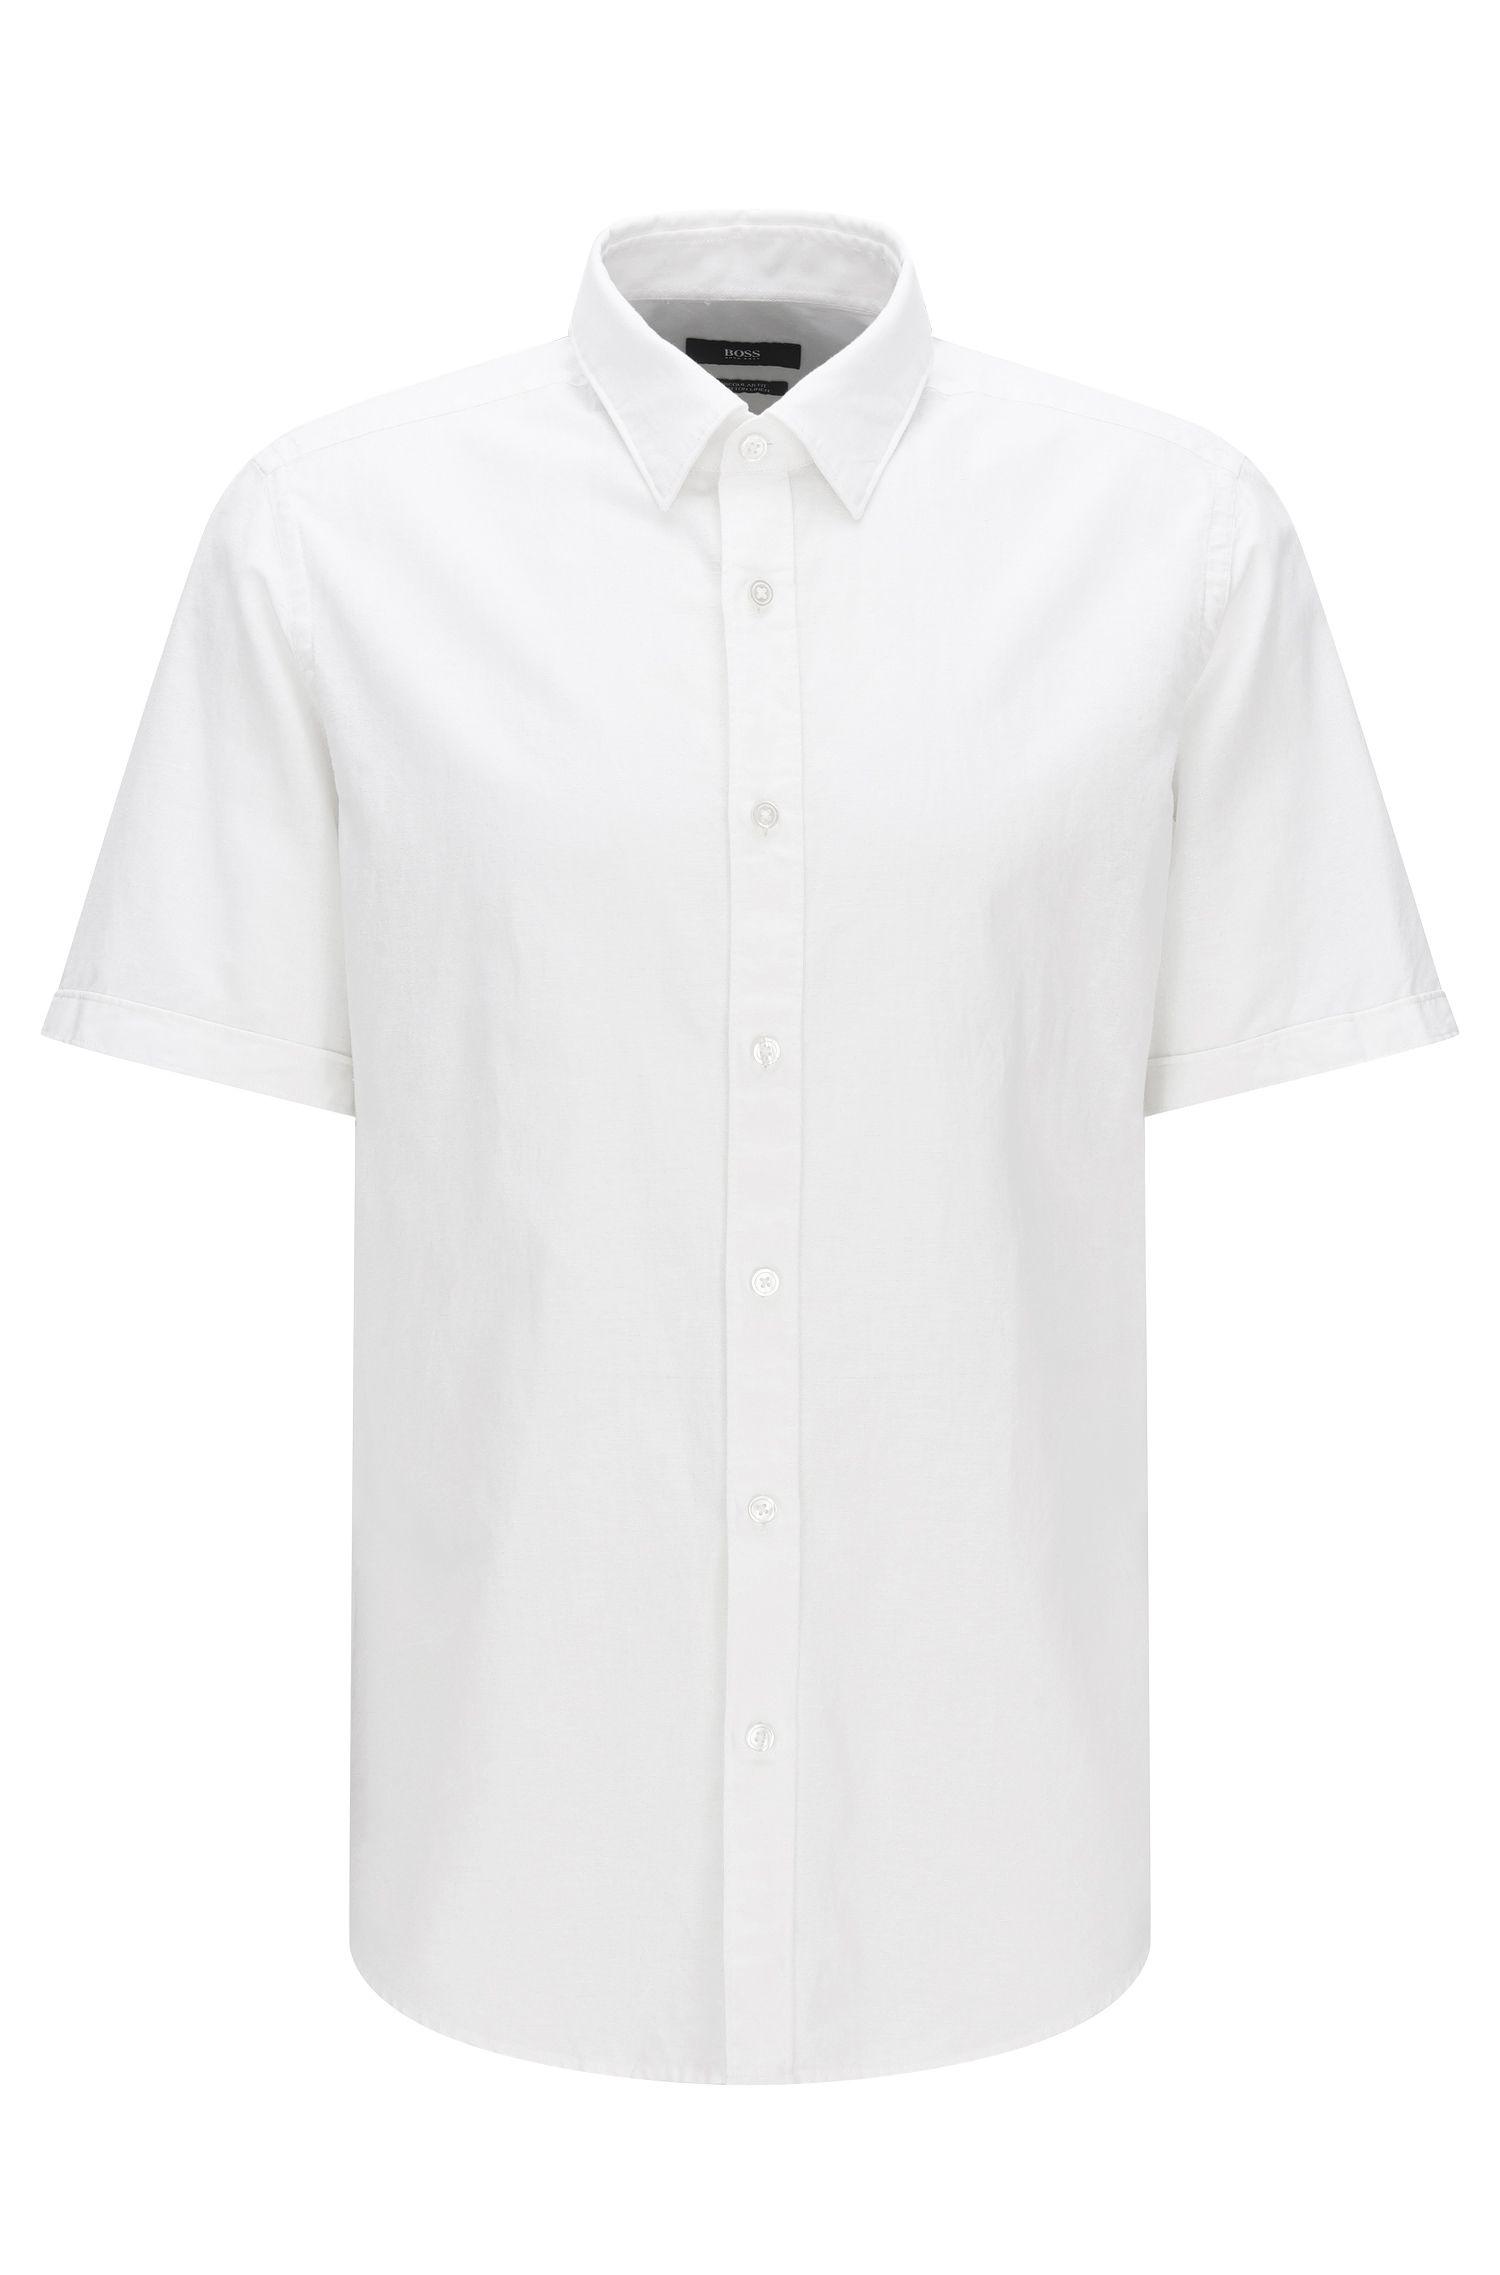 Camisa regular fit de manga corta de algodón mezclado con lino